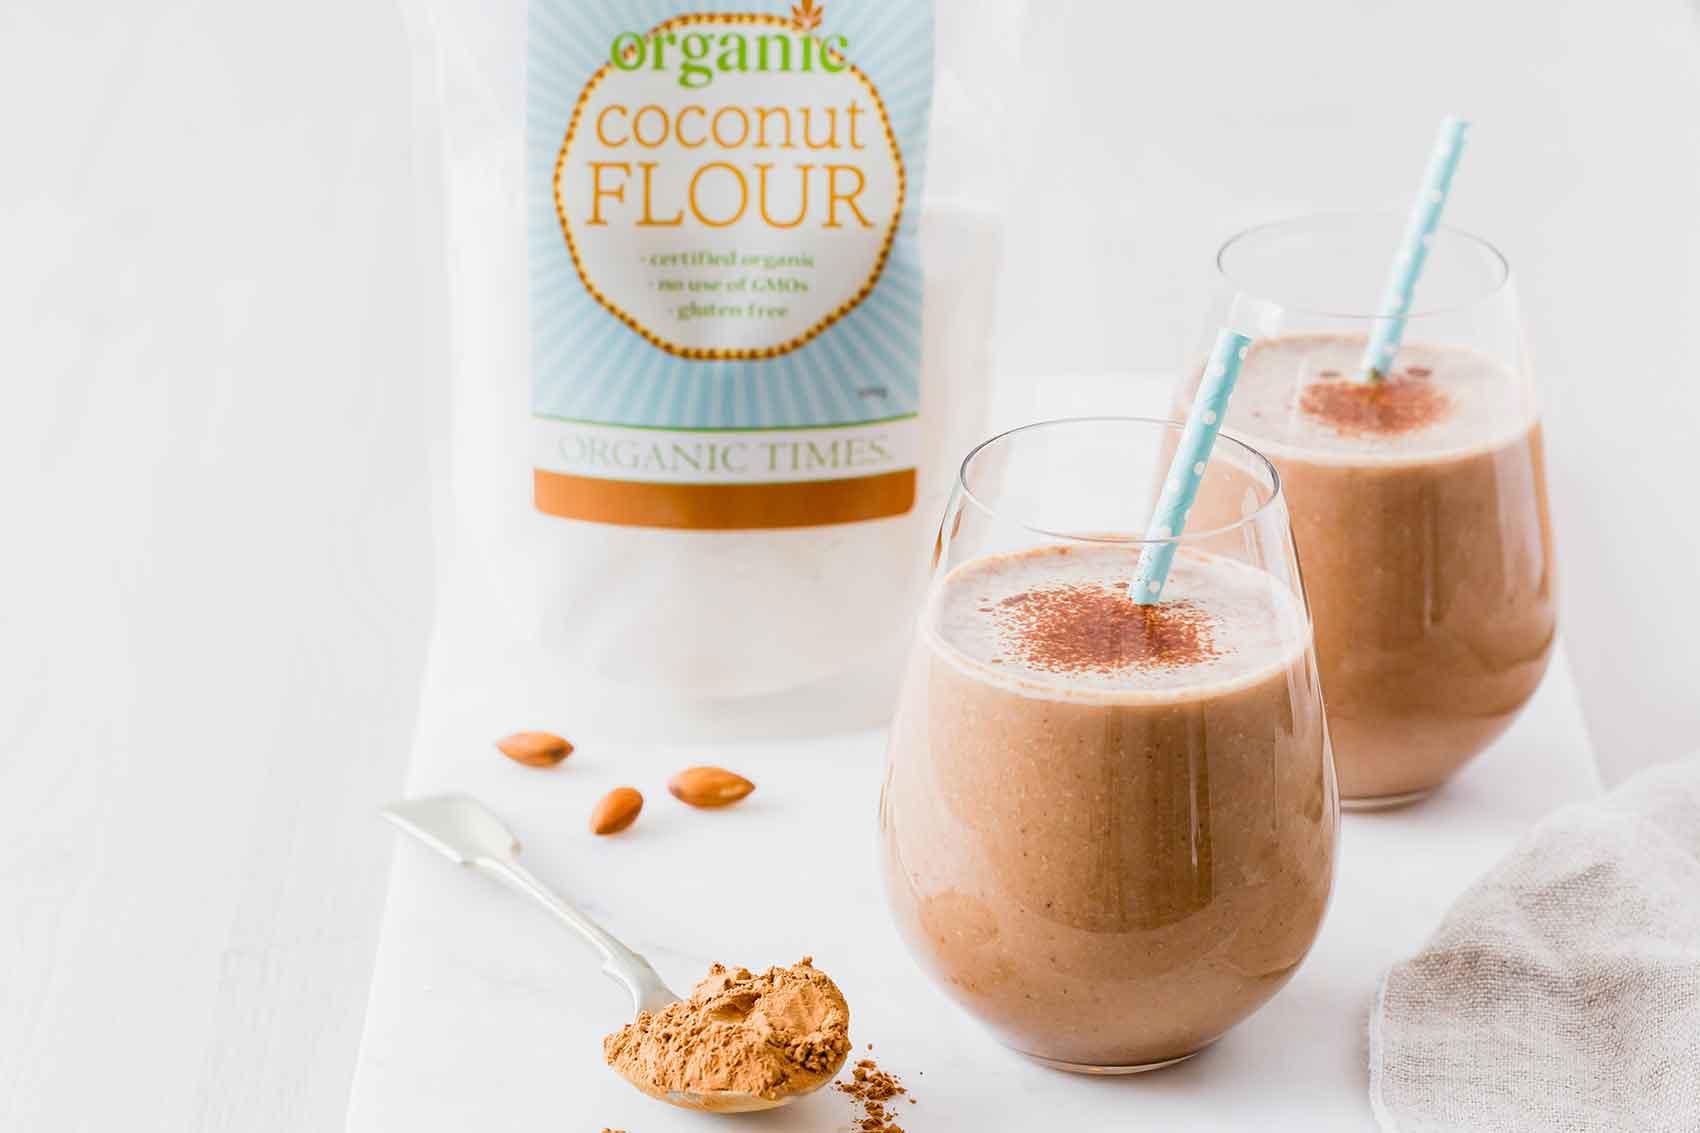 organic times coconut flour next to two glasses of carob banana almond smoothie